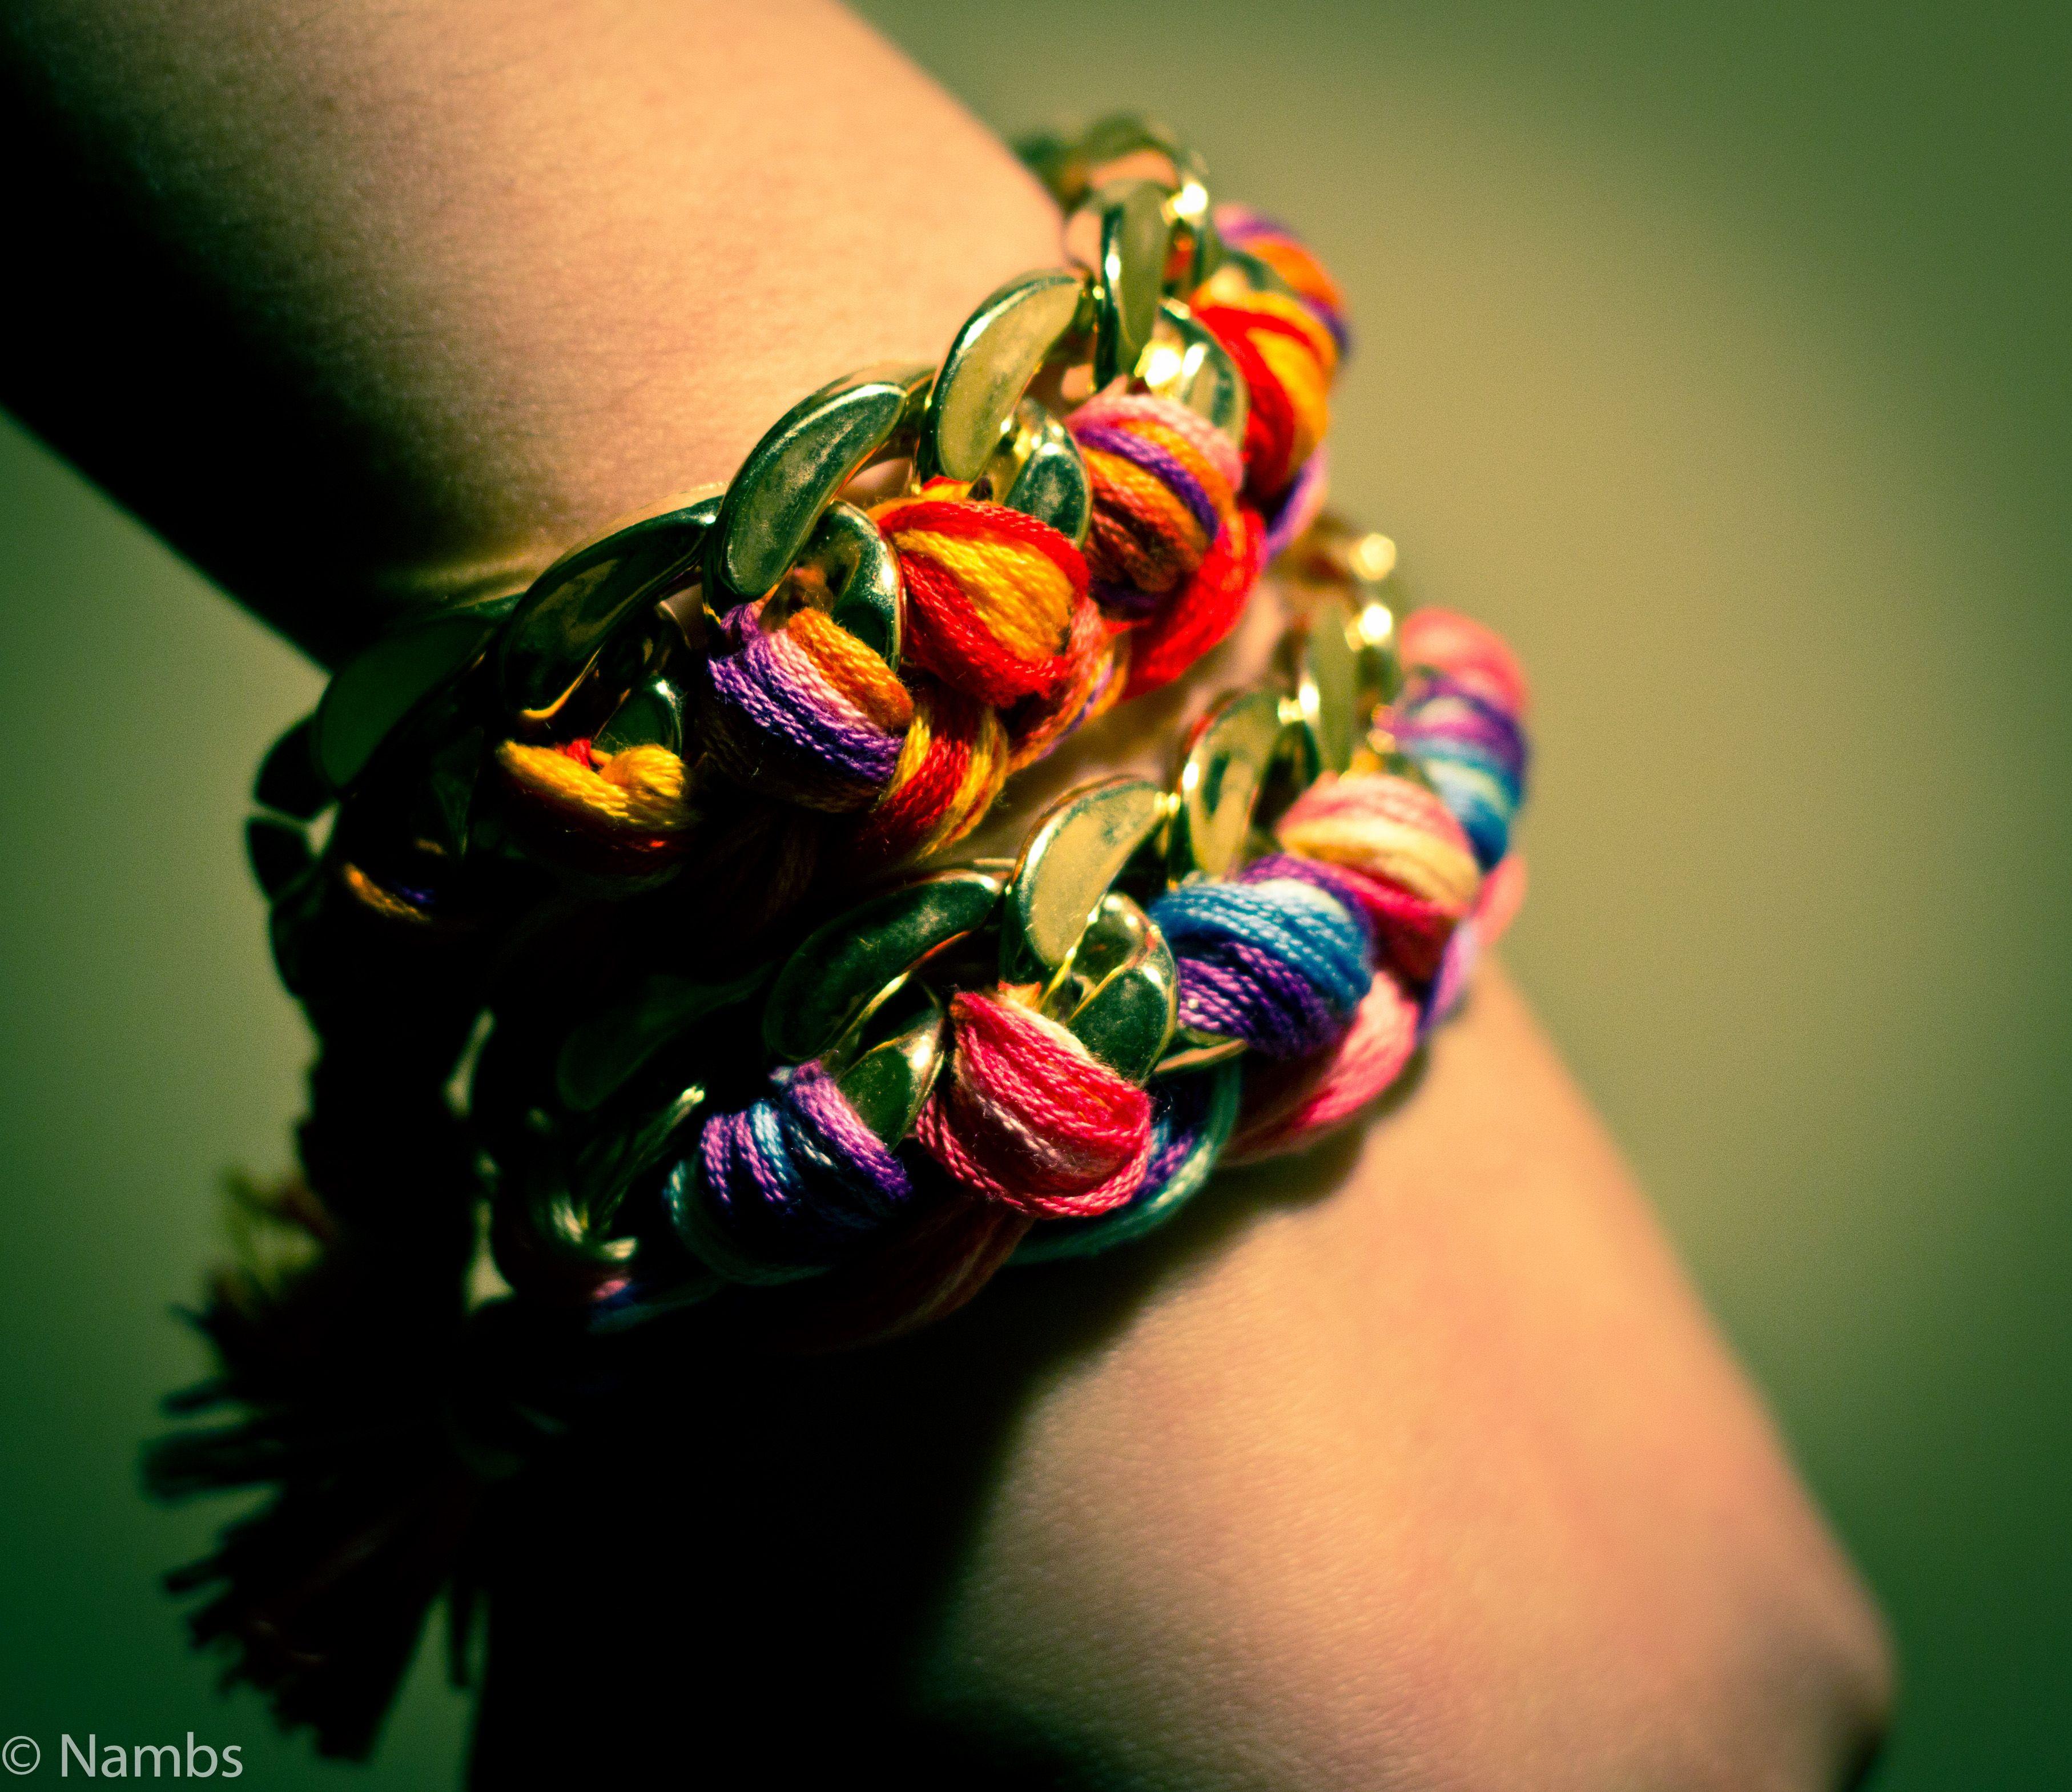 Homemade Bracelet Women Diy Fashion Jewelry Diy Bracelets How To Make Homemade Bracelets